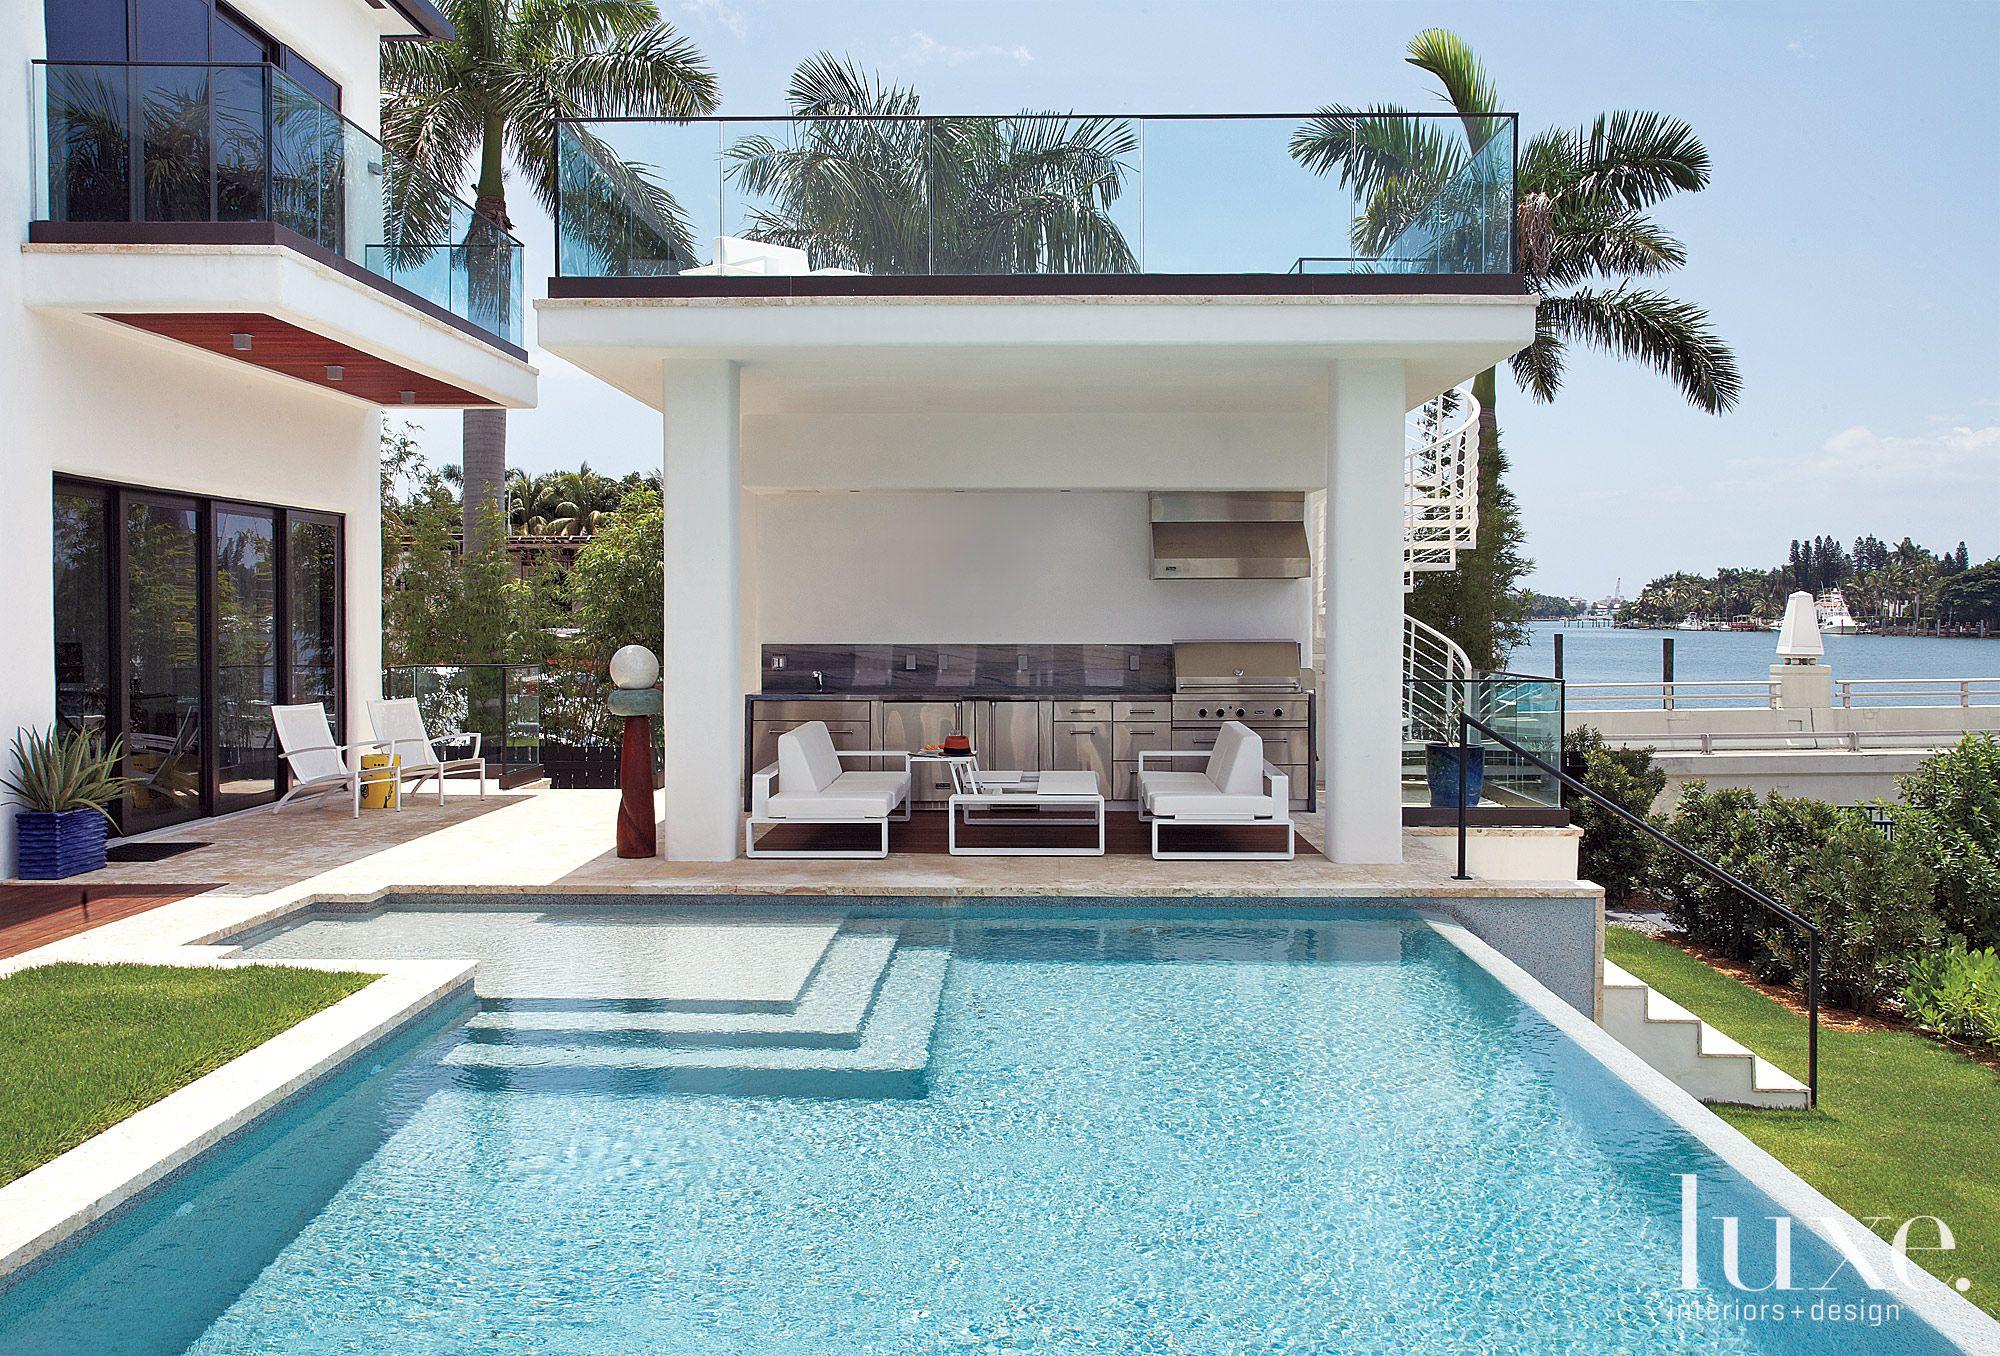 Modern Bi-level Poolside Cabana